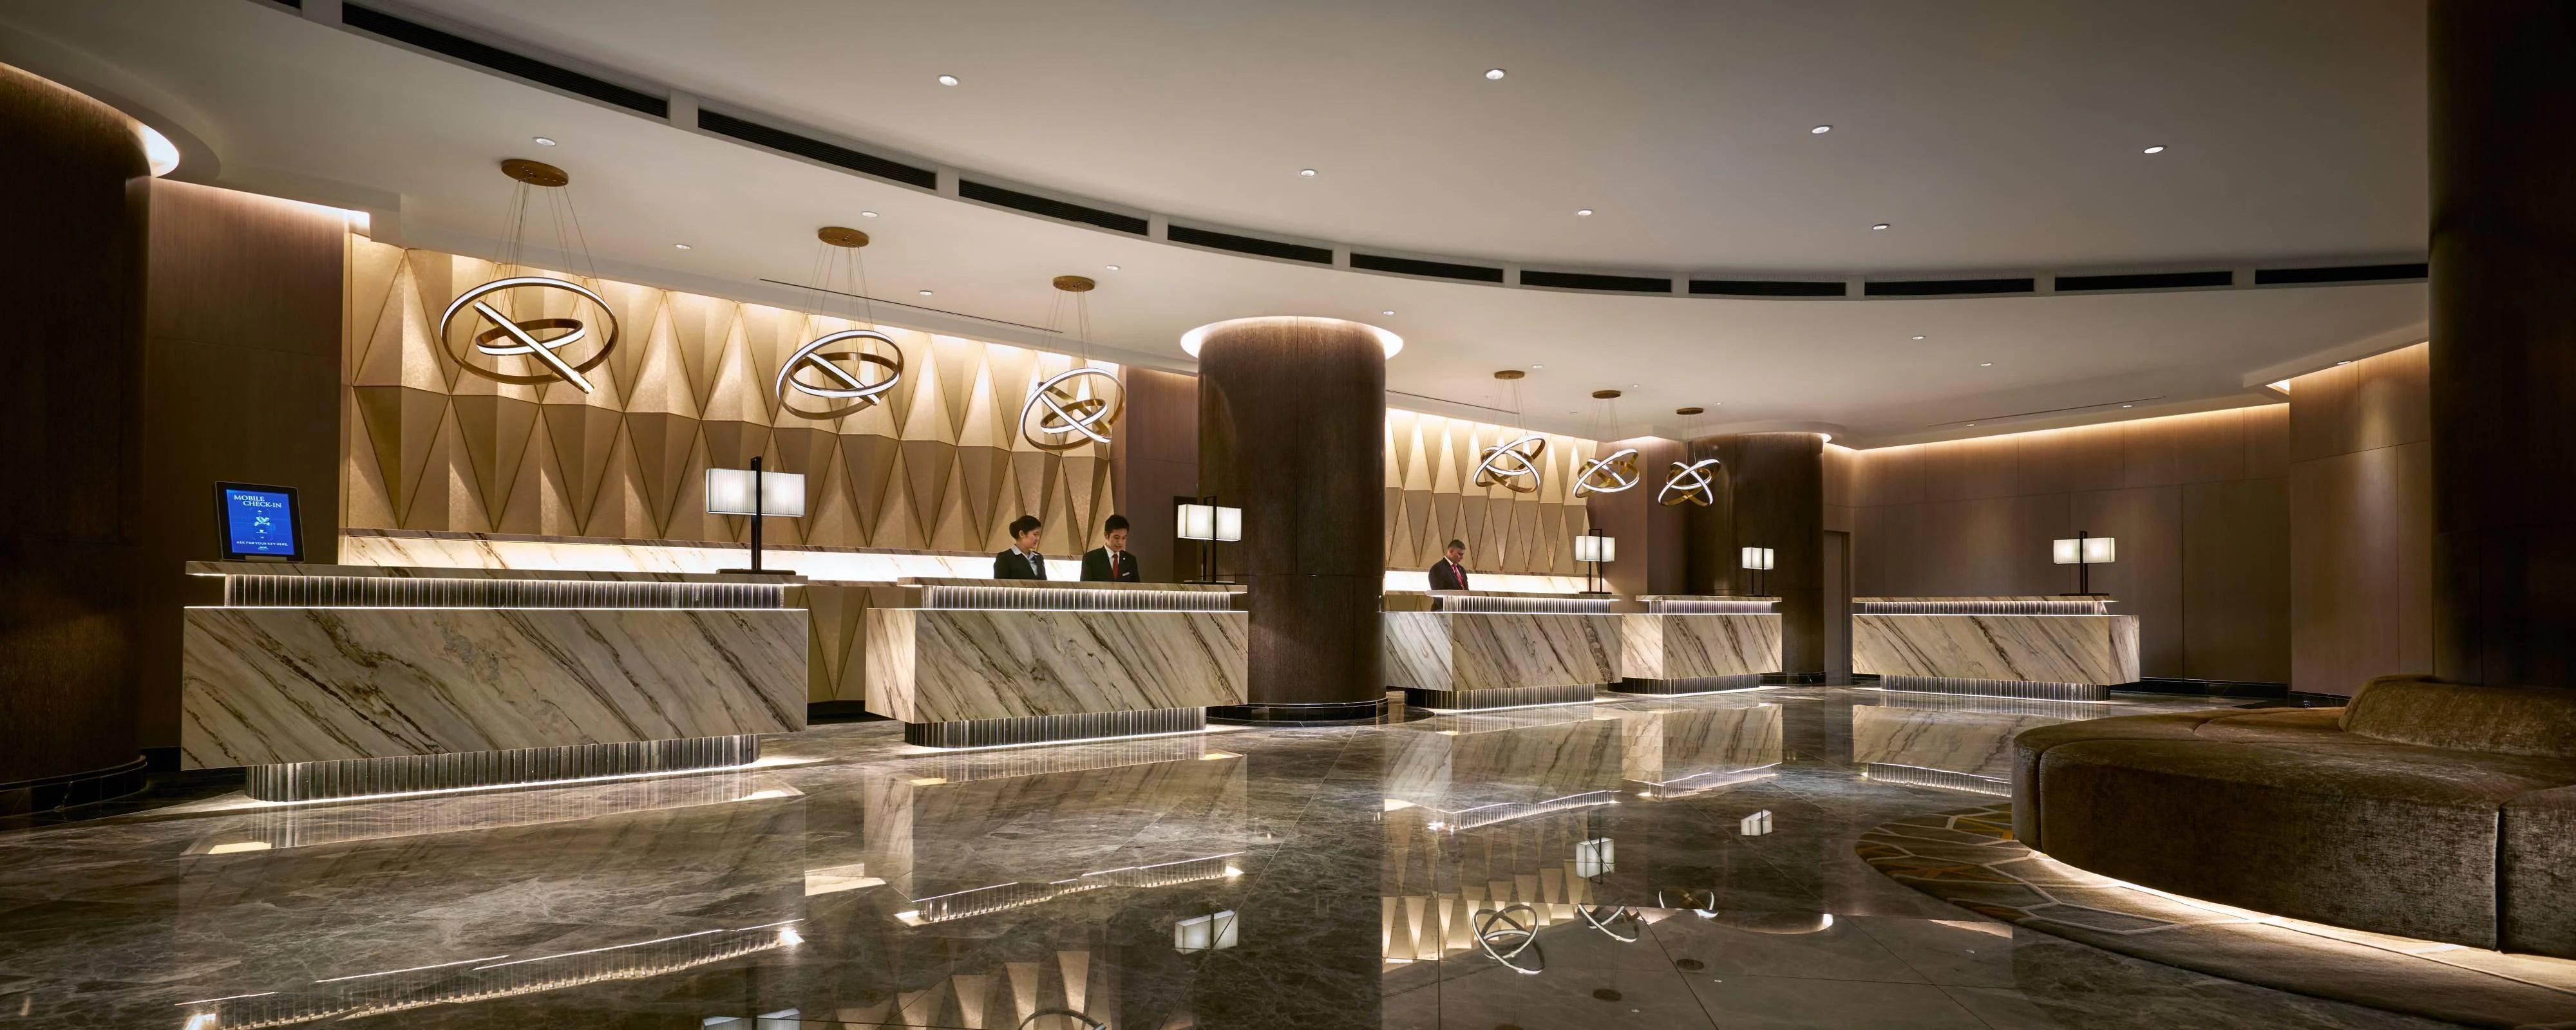 Luxury 5 Star Hotel In Central Kuala Lumpur Bukit Bintang